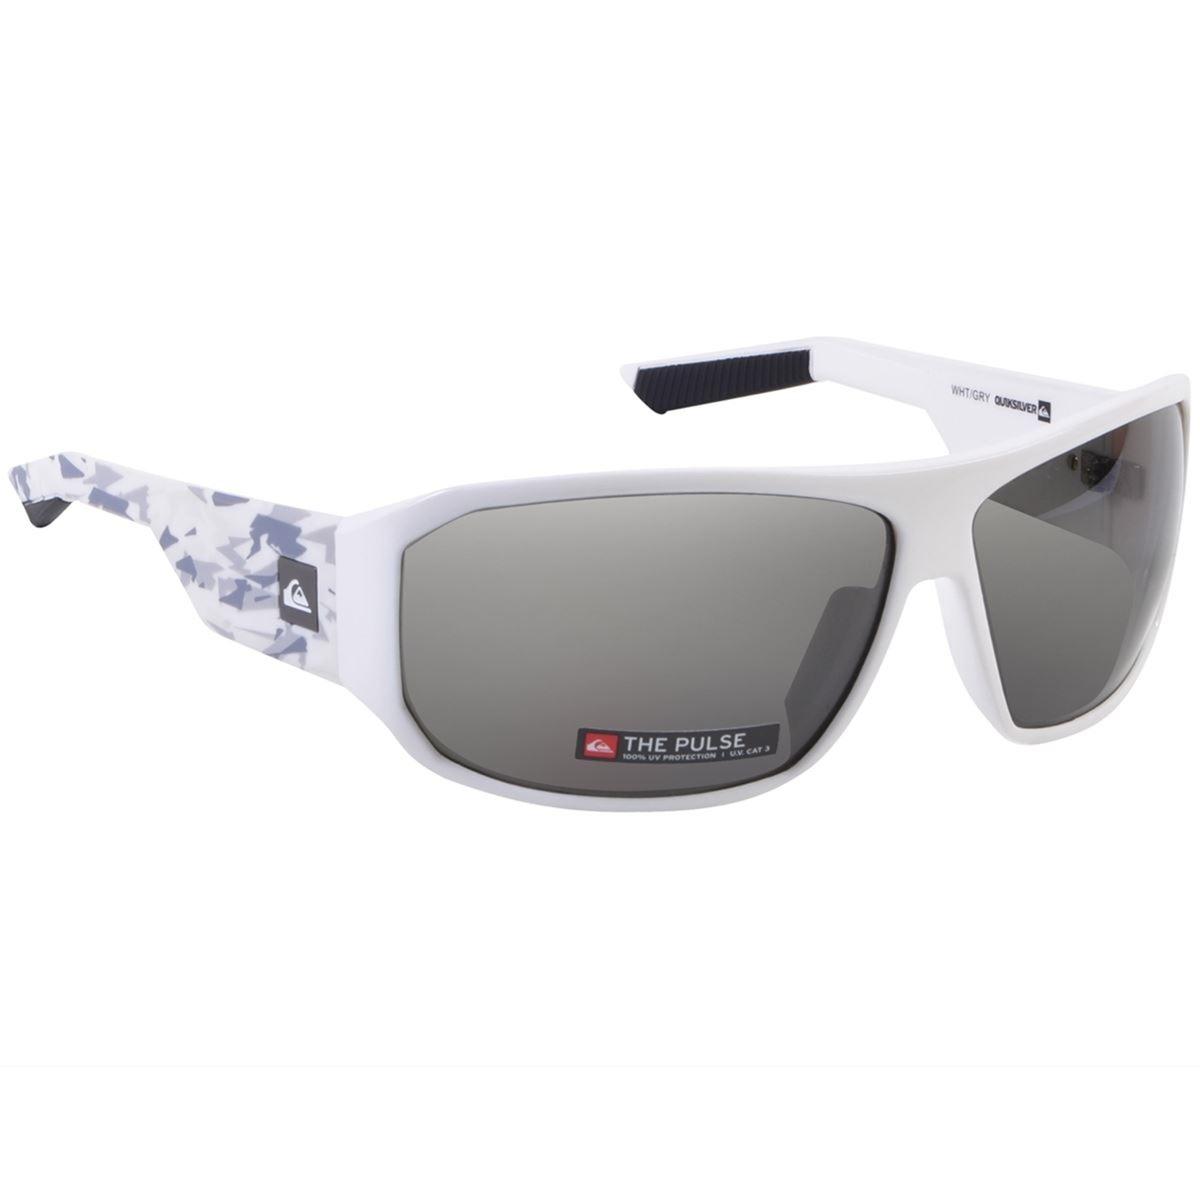 5a64f58881b29 Óculos Quiksilver Pulse - R  219,00 em Mercado Livre